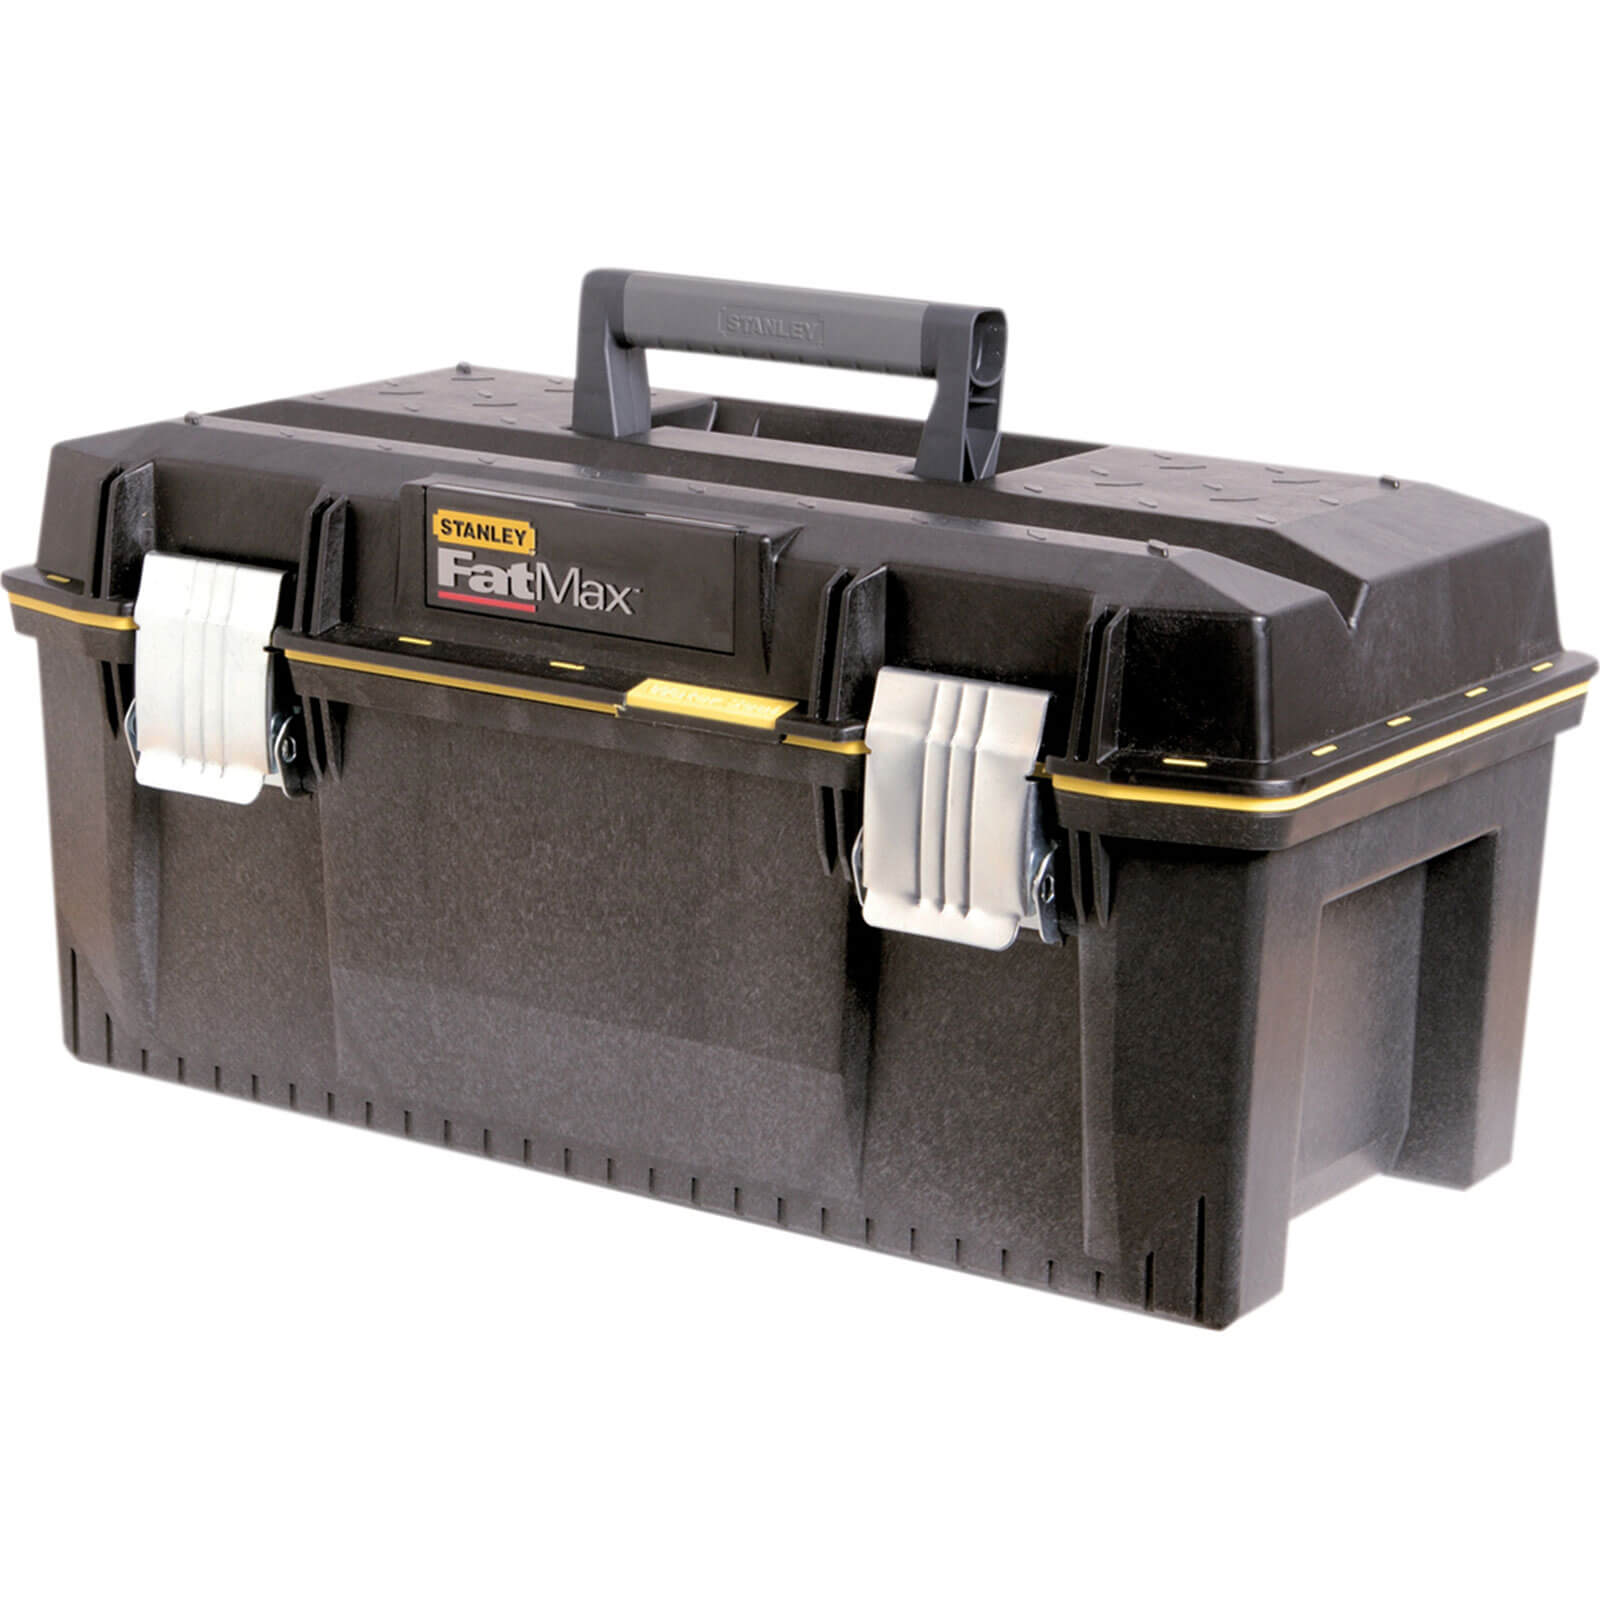 Image of Stanley Fatmax Waterproof Structural Foam Toolbox 580mm